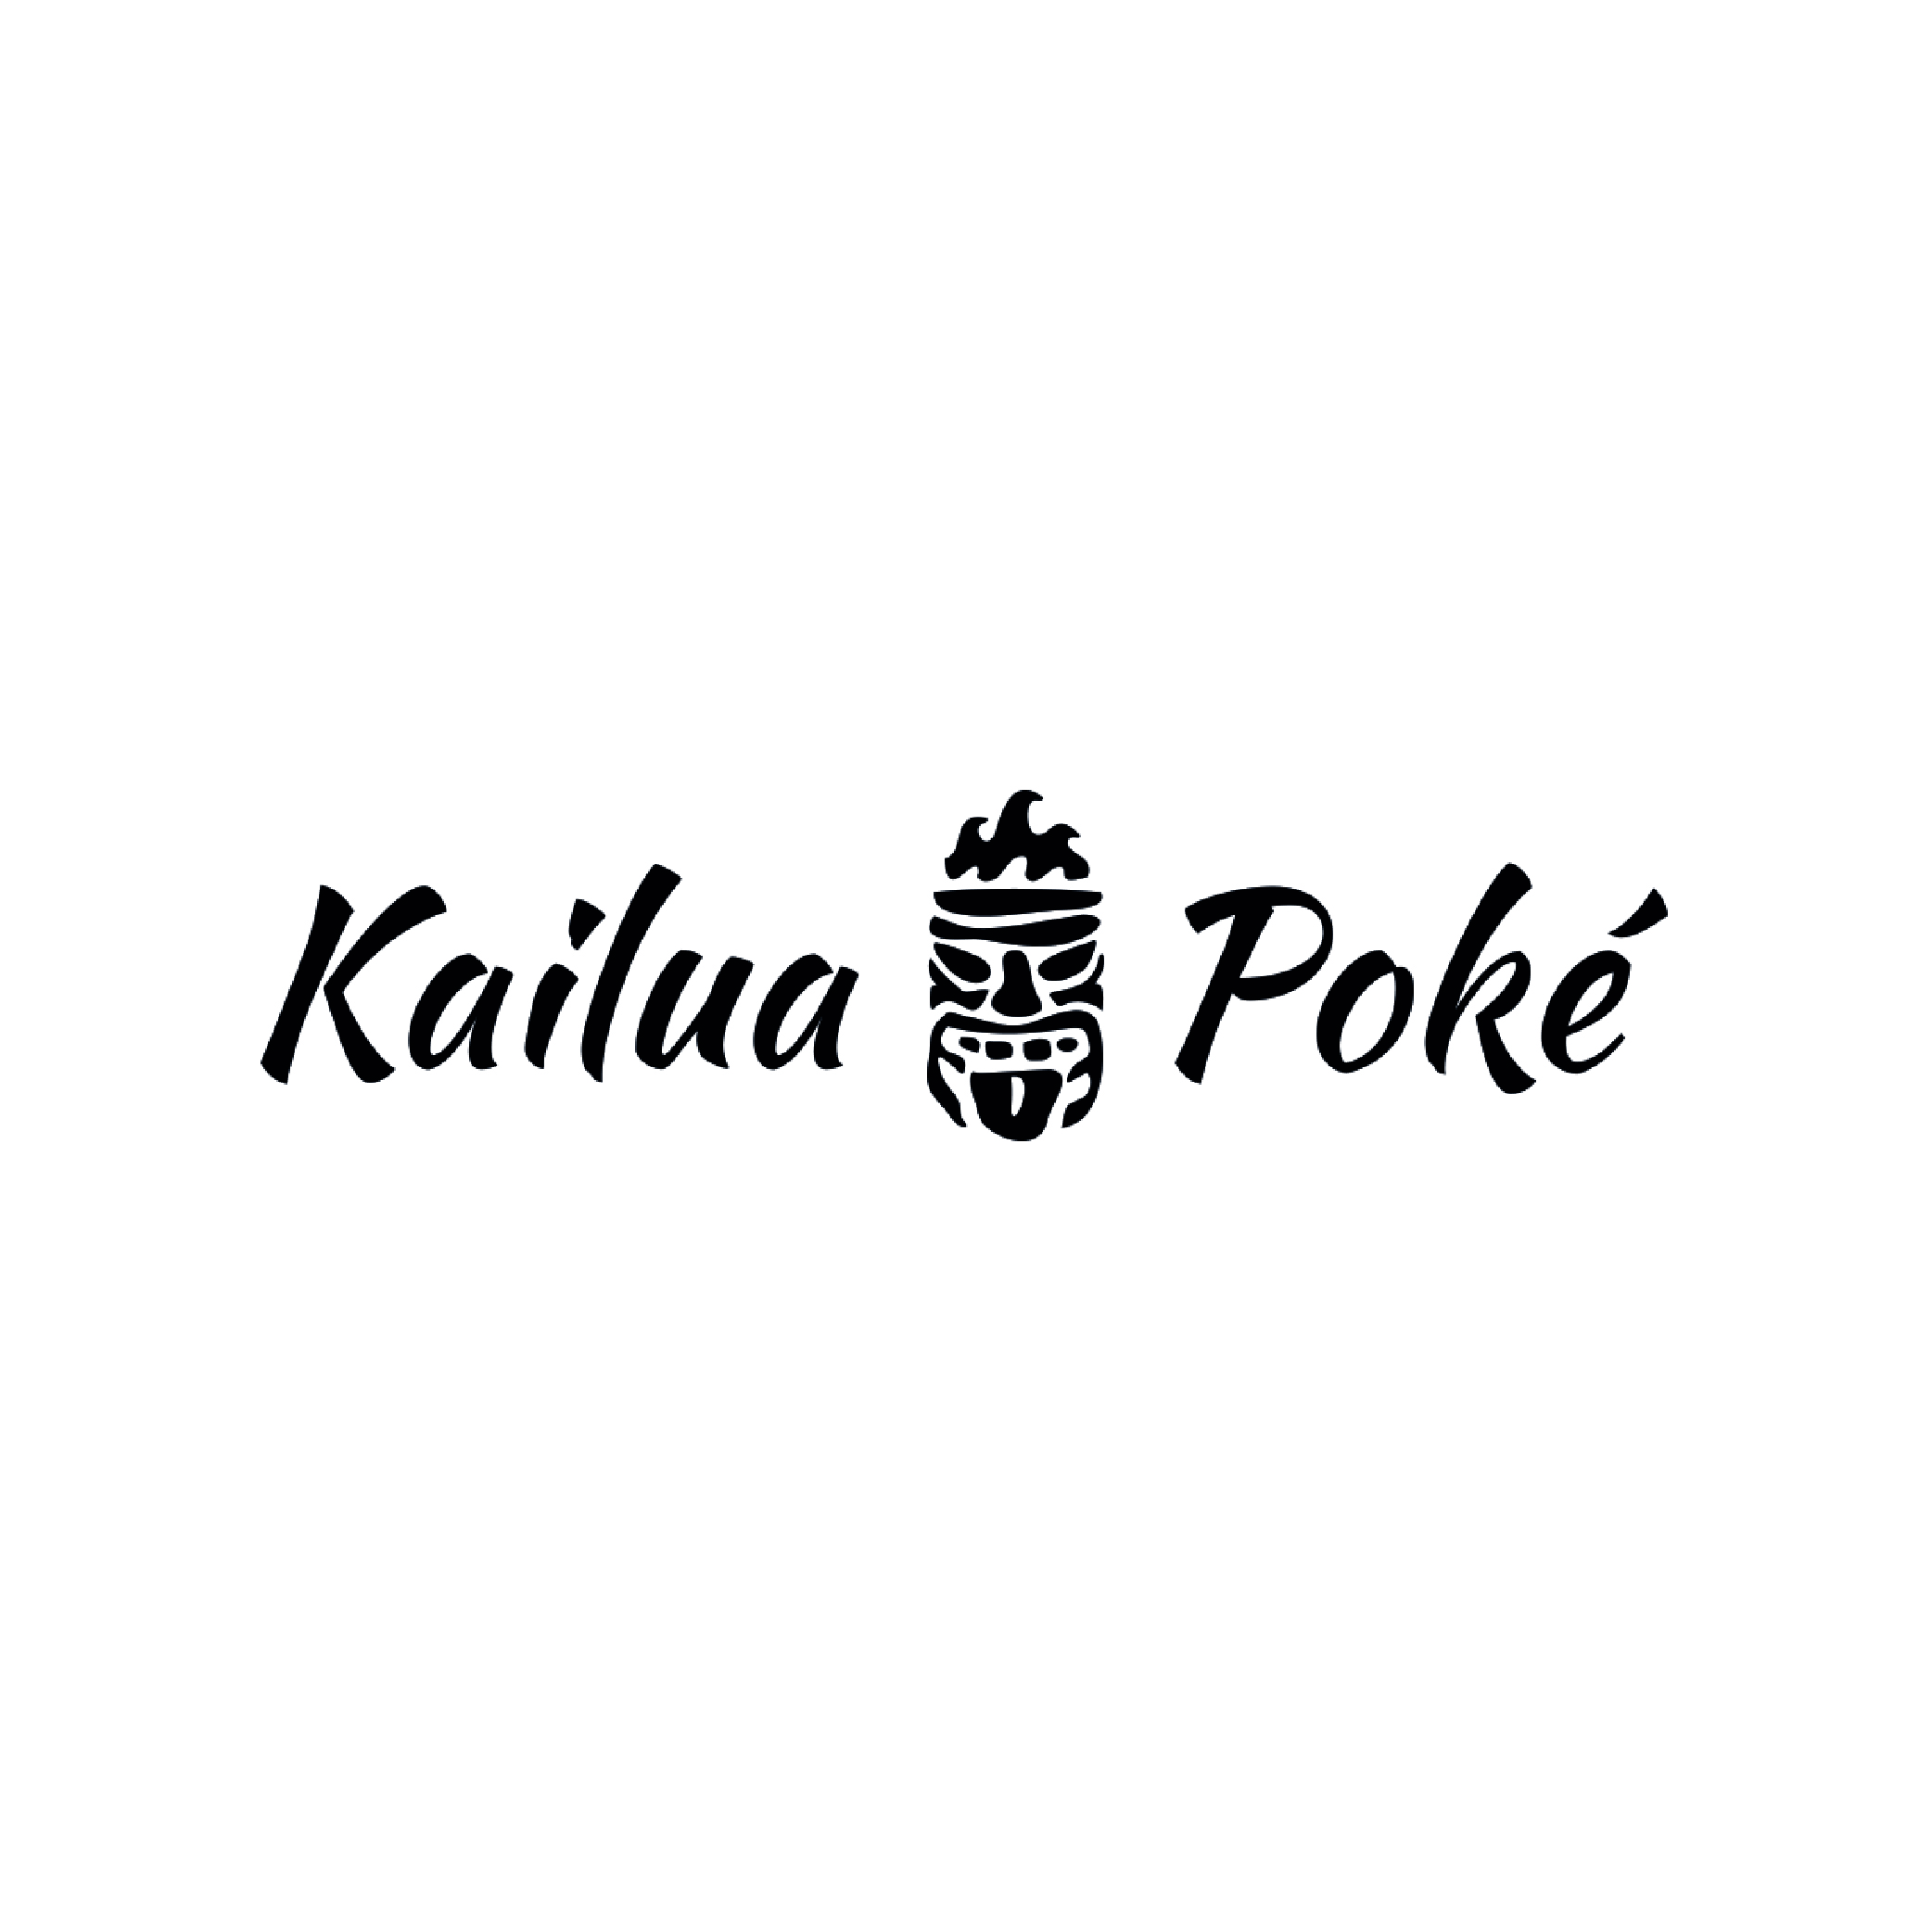 9_logo-kailua-poke